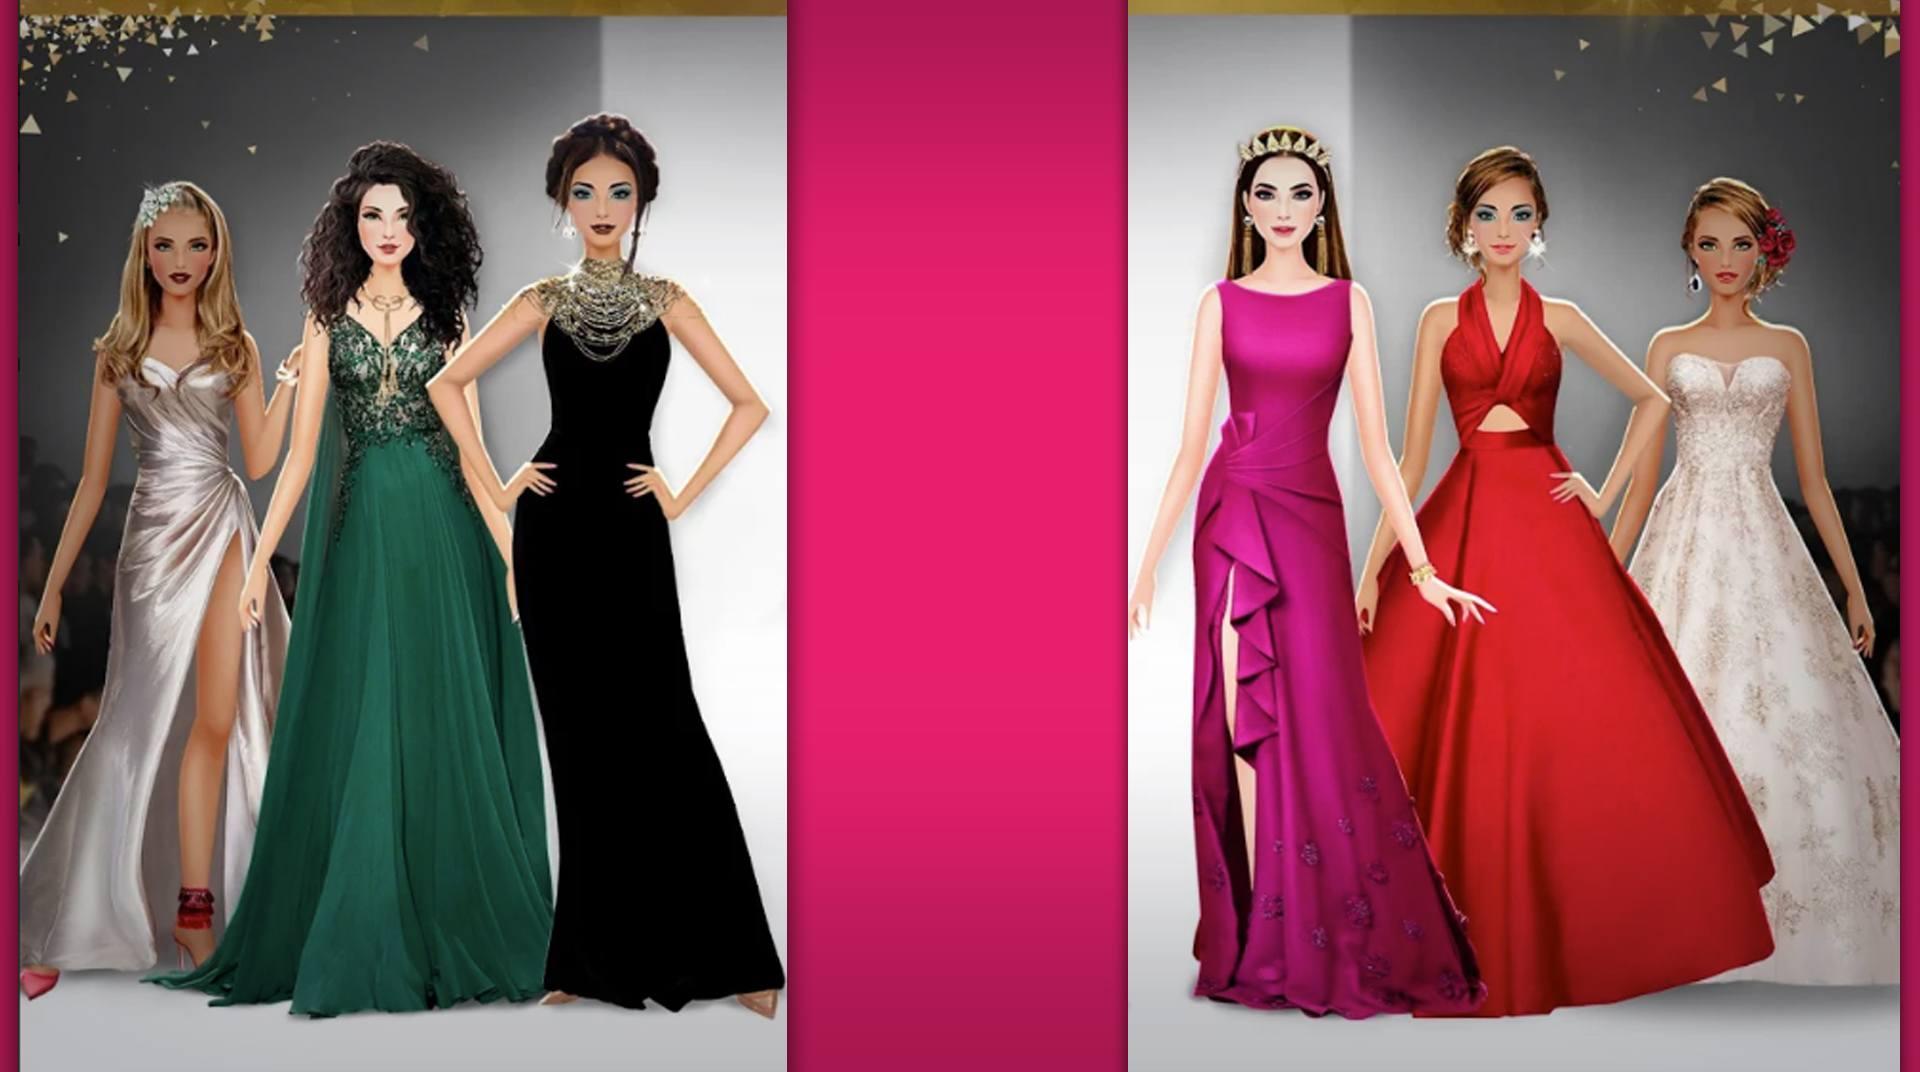 Download International Fashion Stylist Model Design Studio On Pc With Bluestacks